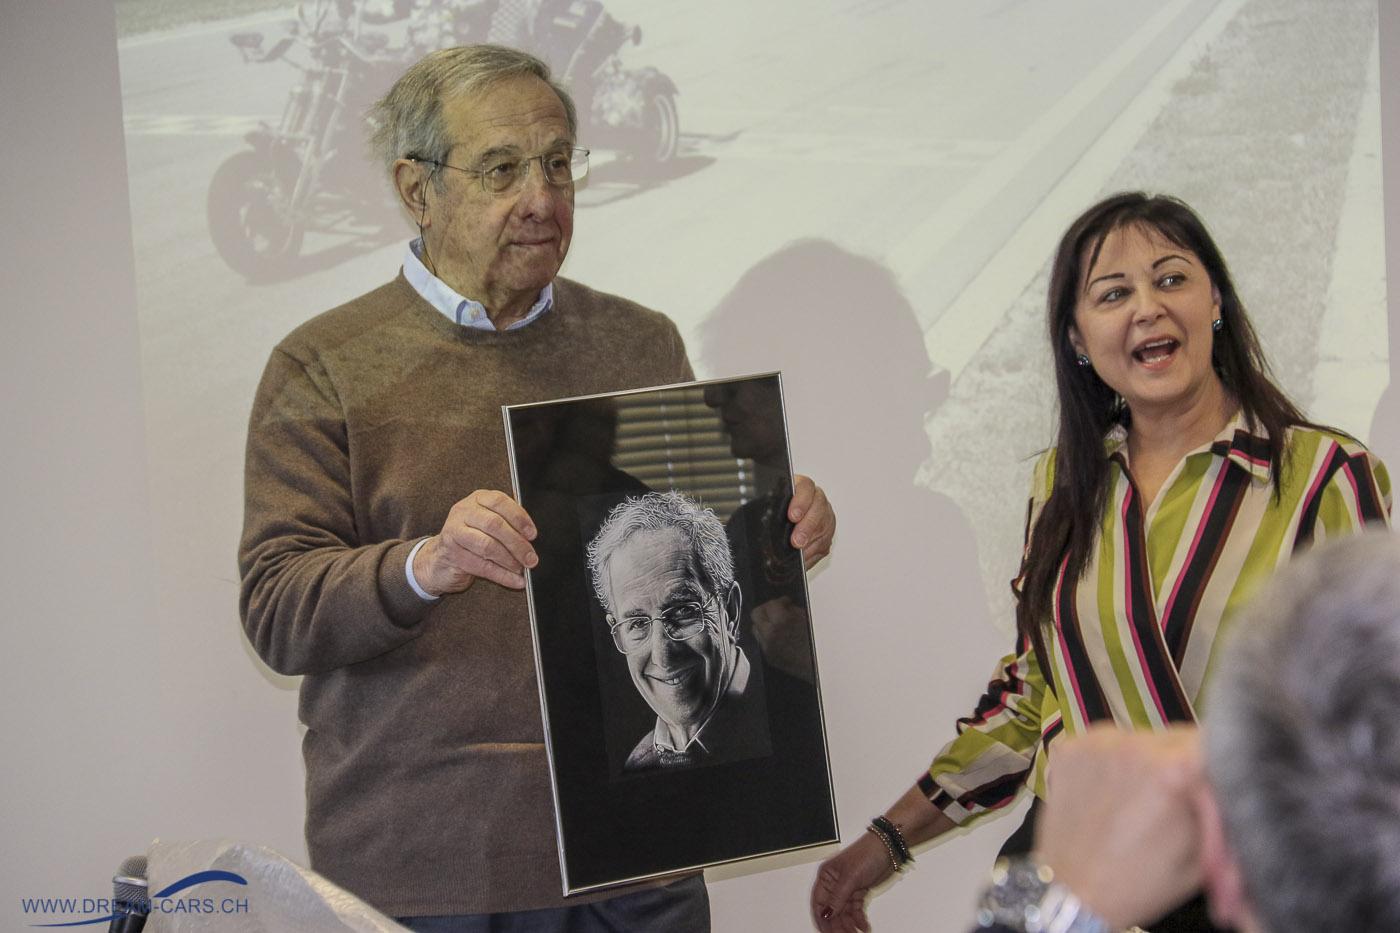 Una giornata con Mauro Forghieri, 15.03.2019, Modena. Ing. Mauro Forghieri mit einem Bild von Sandra Malagoli (links)